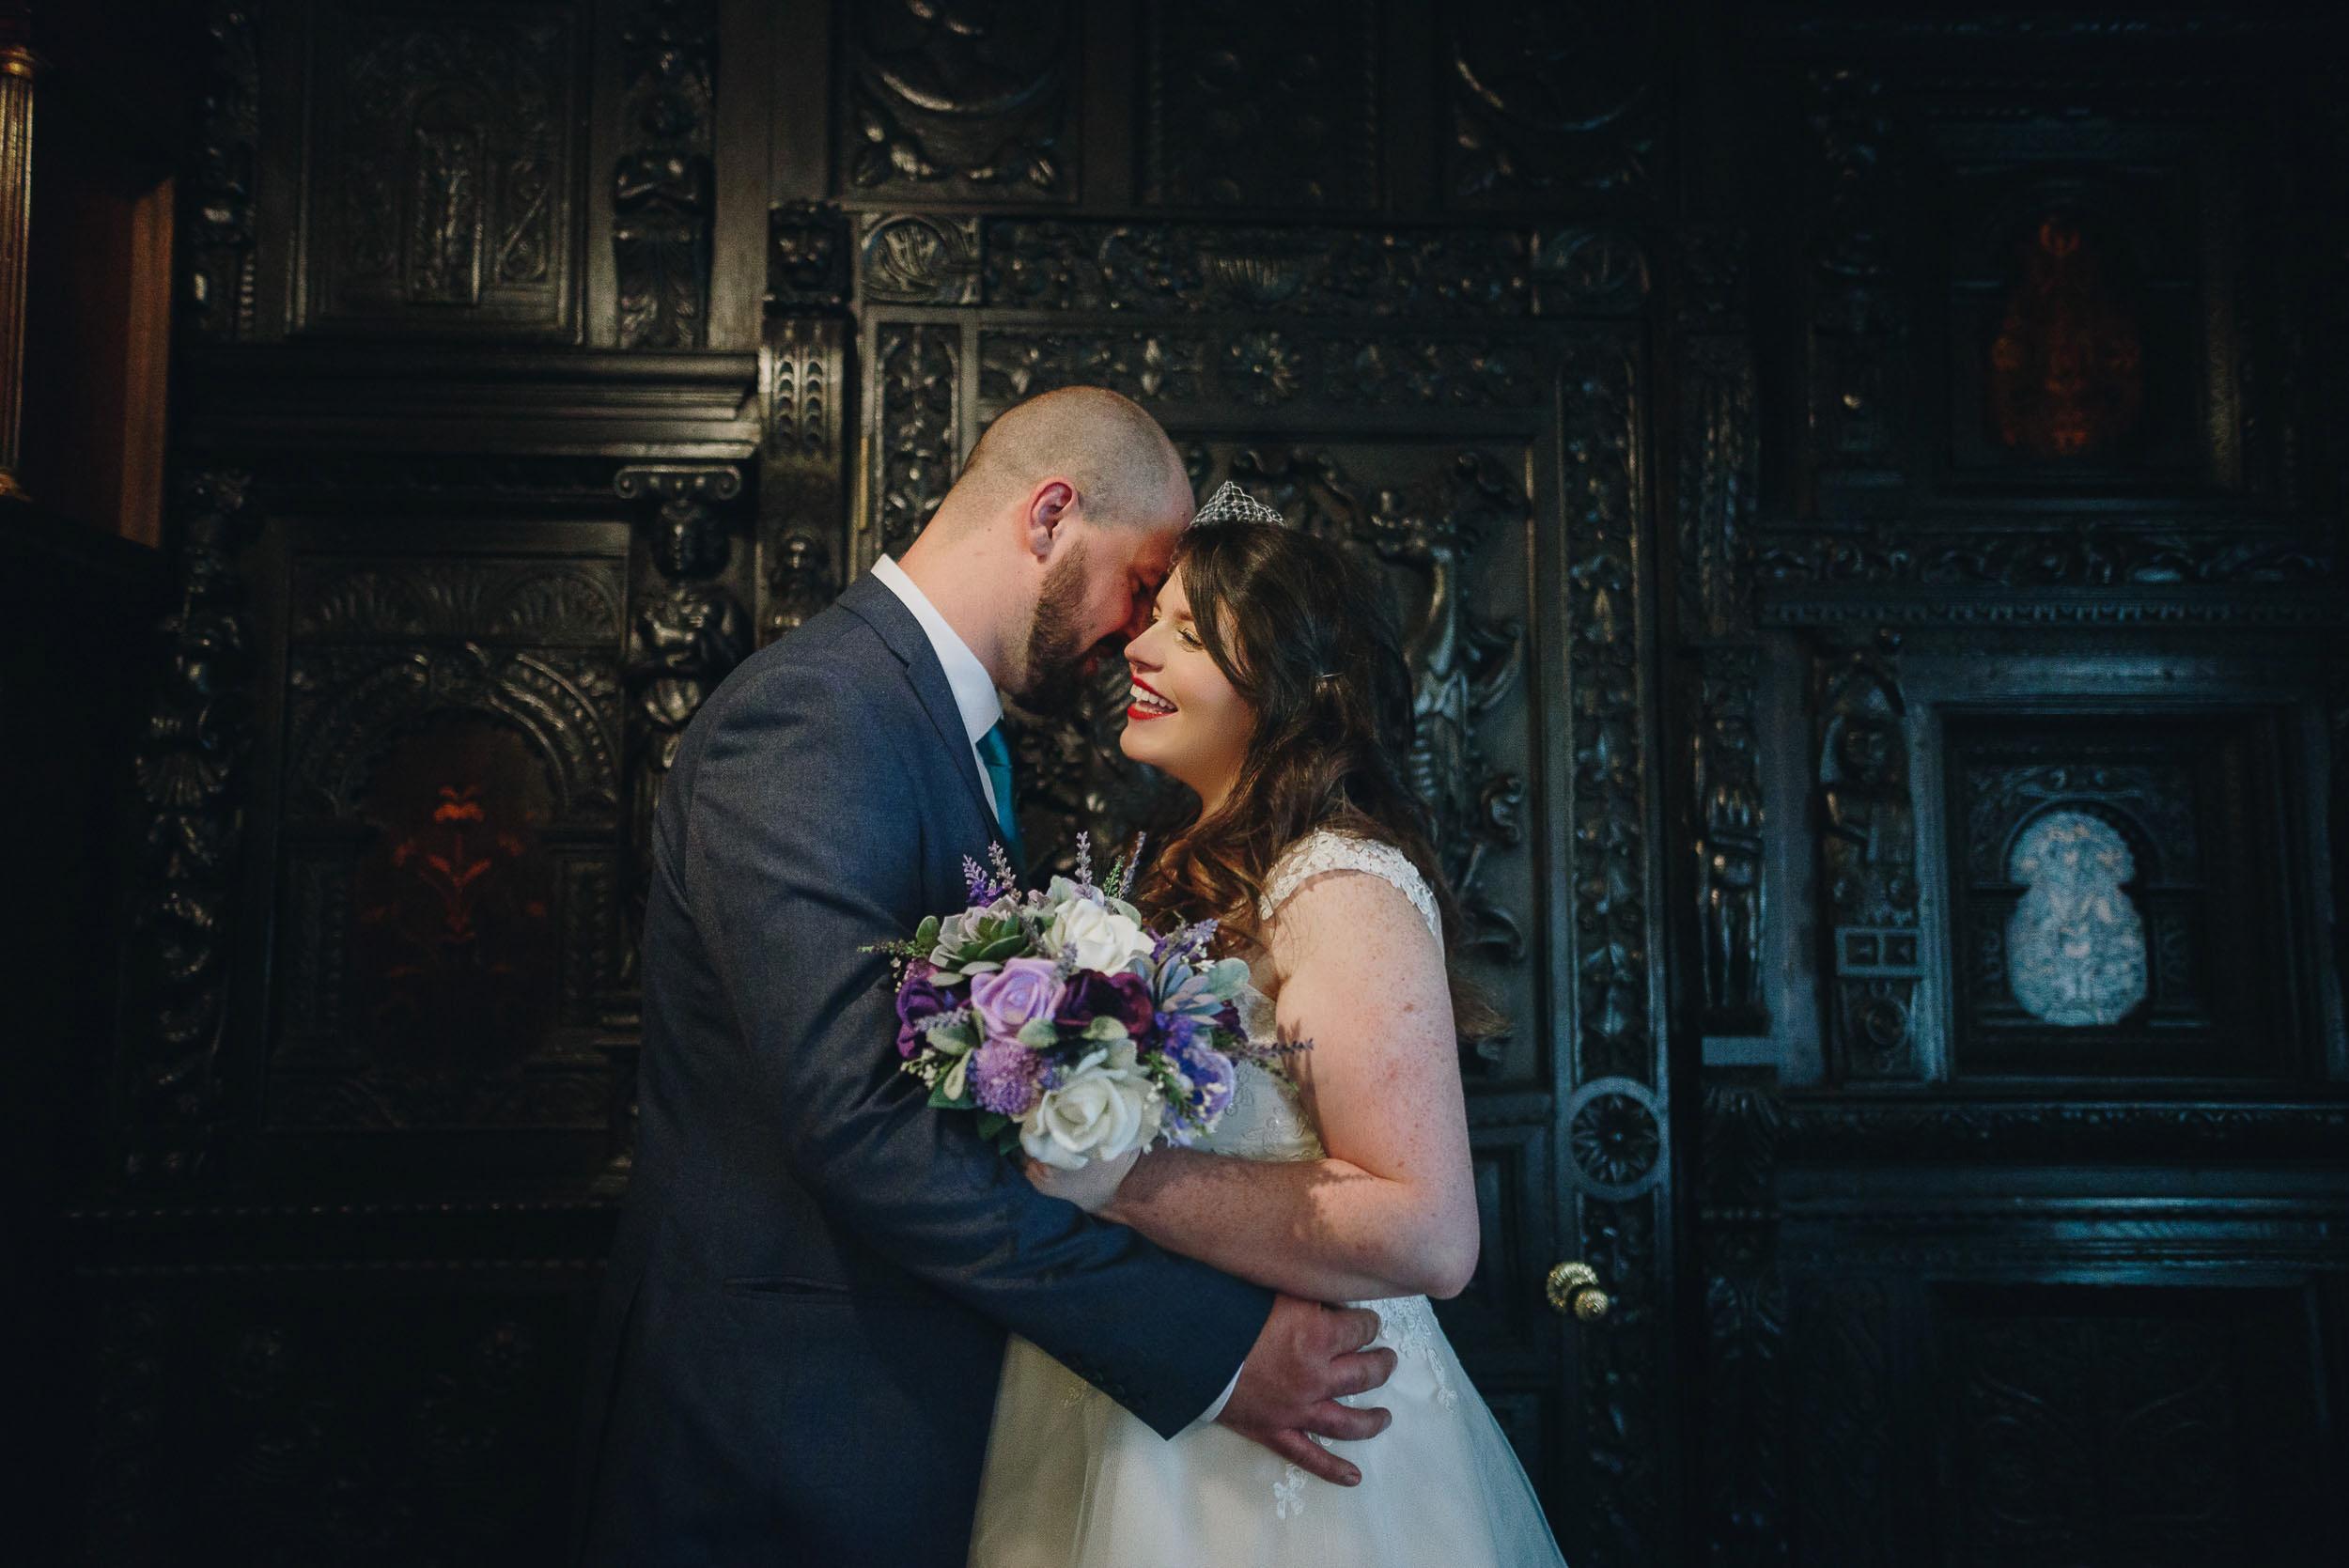 Smithills-hall-wedding-manchester-the-barlow-edgworth-hadfield-51.jpg